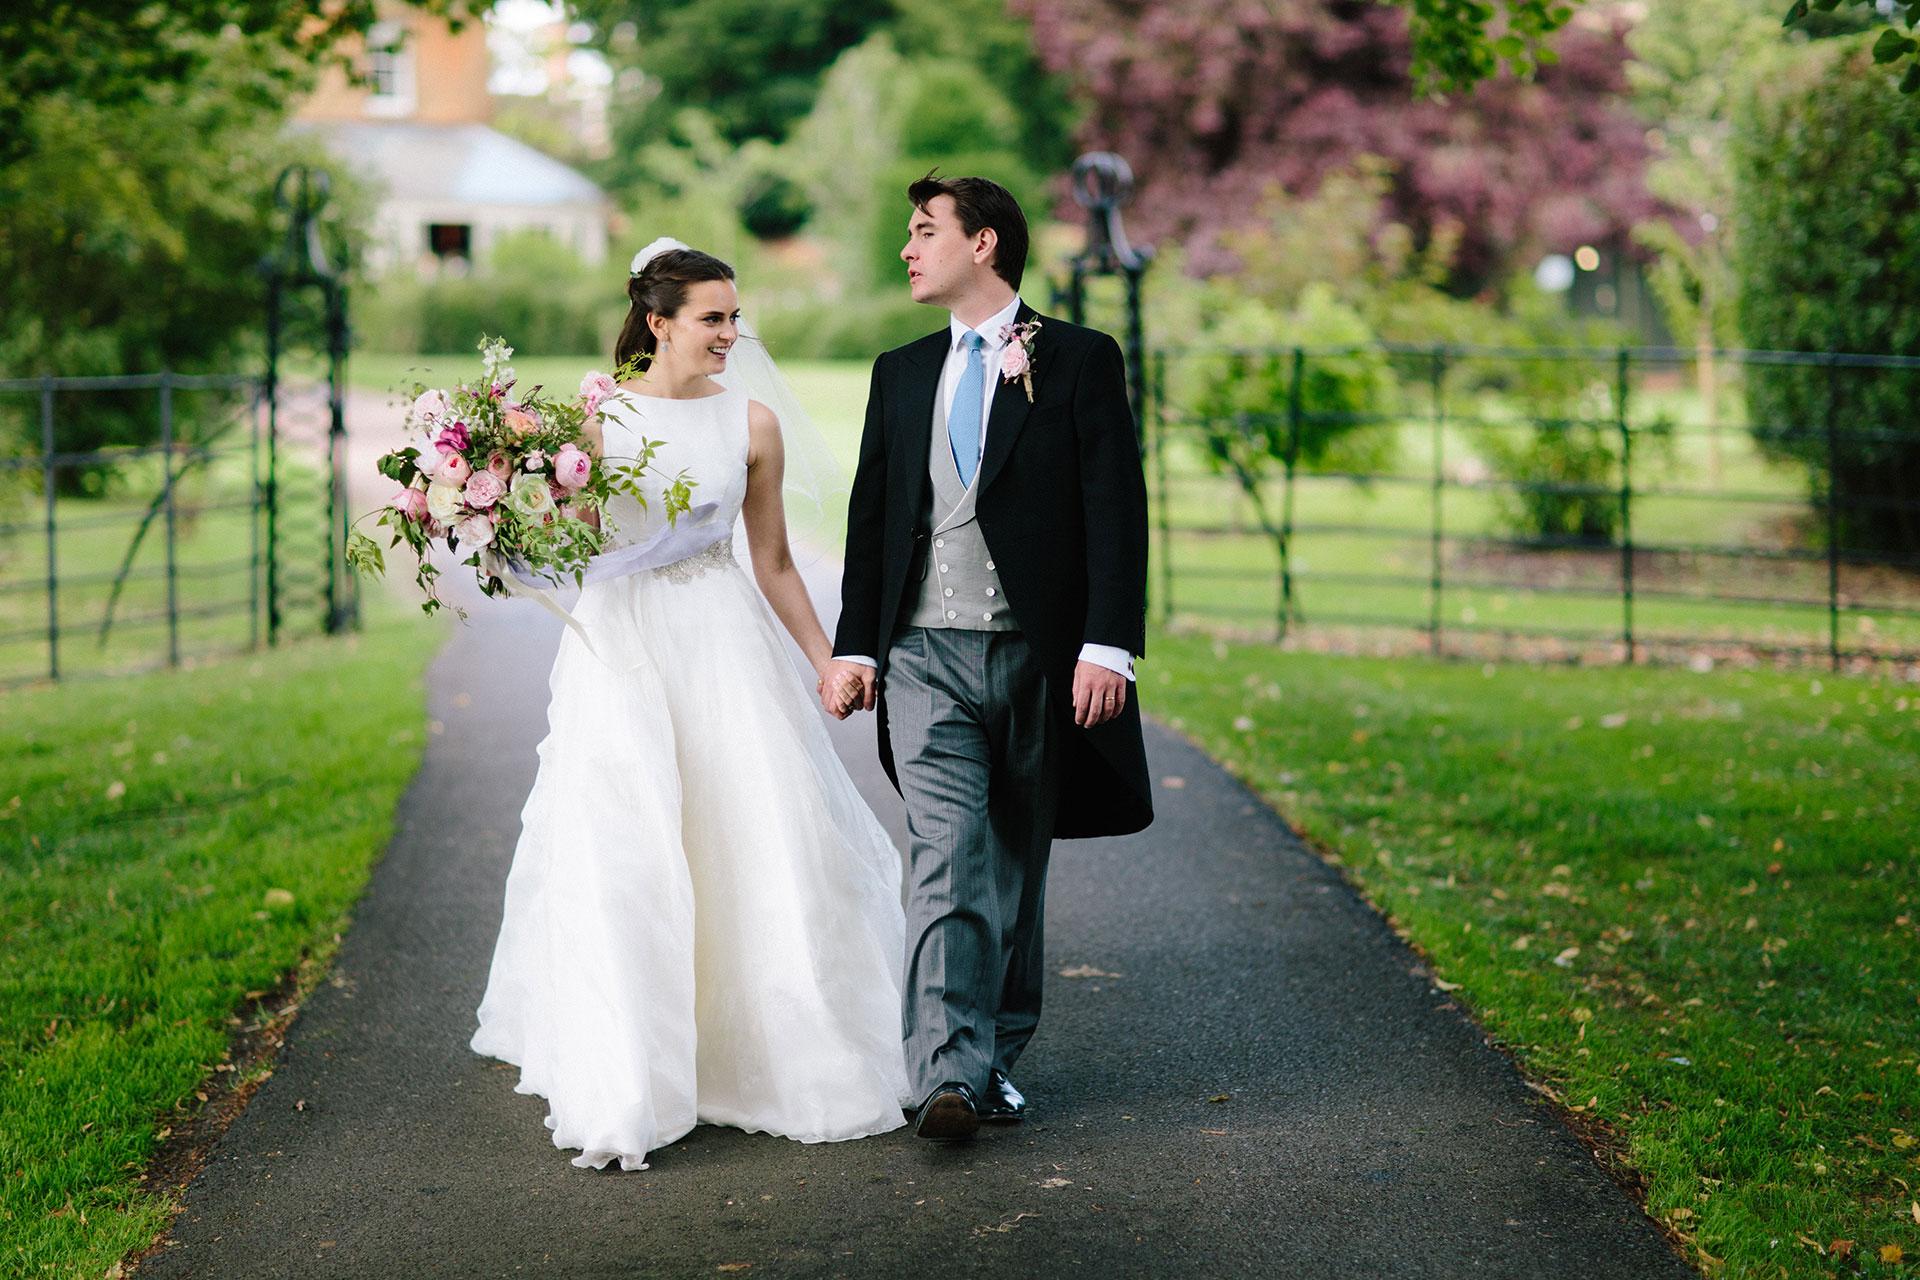 Langar-Hall-wedding-photographer-in-Nottinghamshire-Michael-Newington-Gray-59.jpg